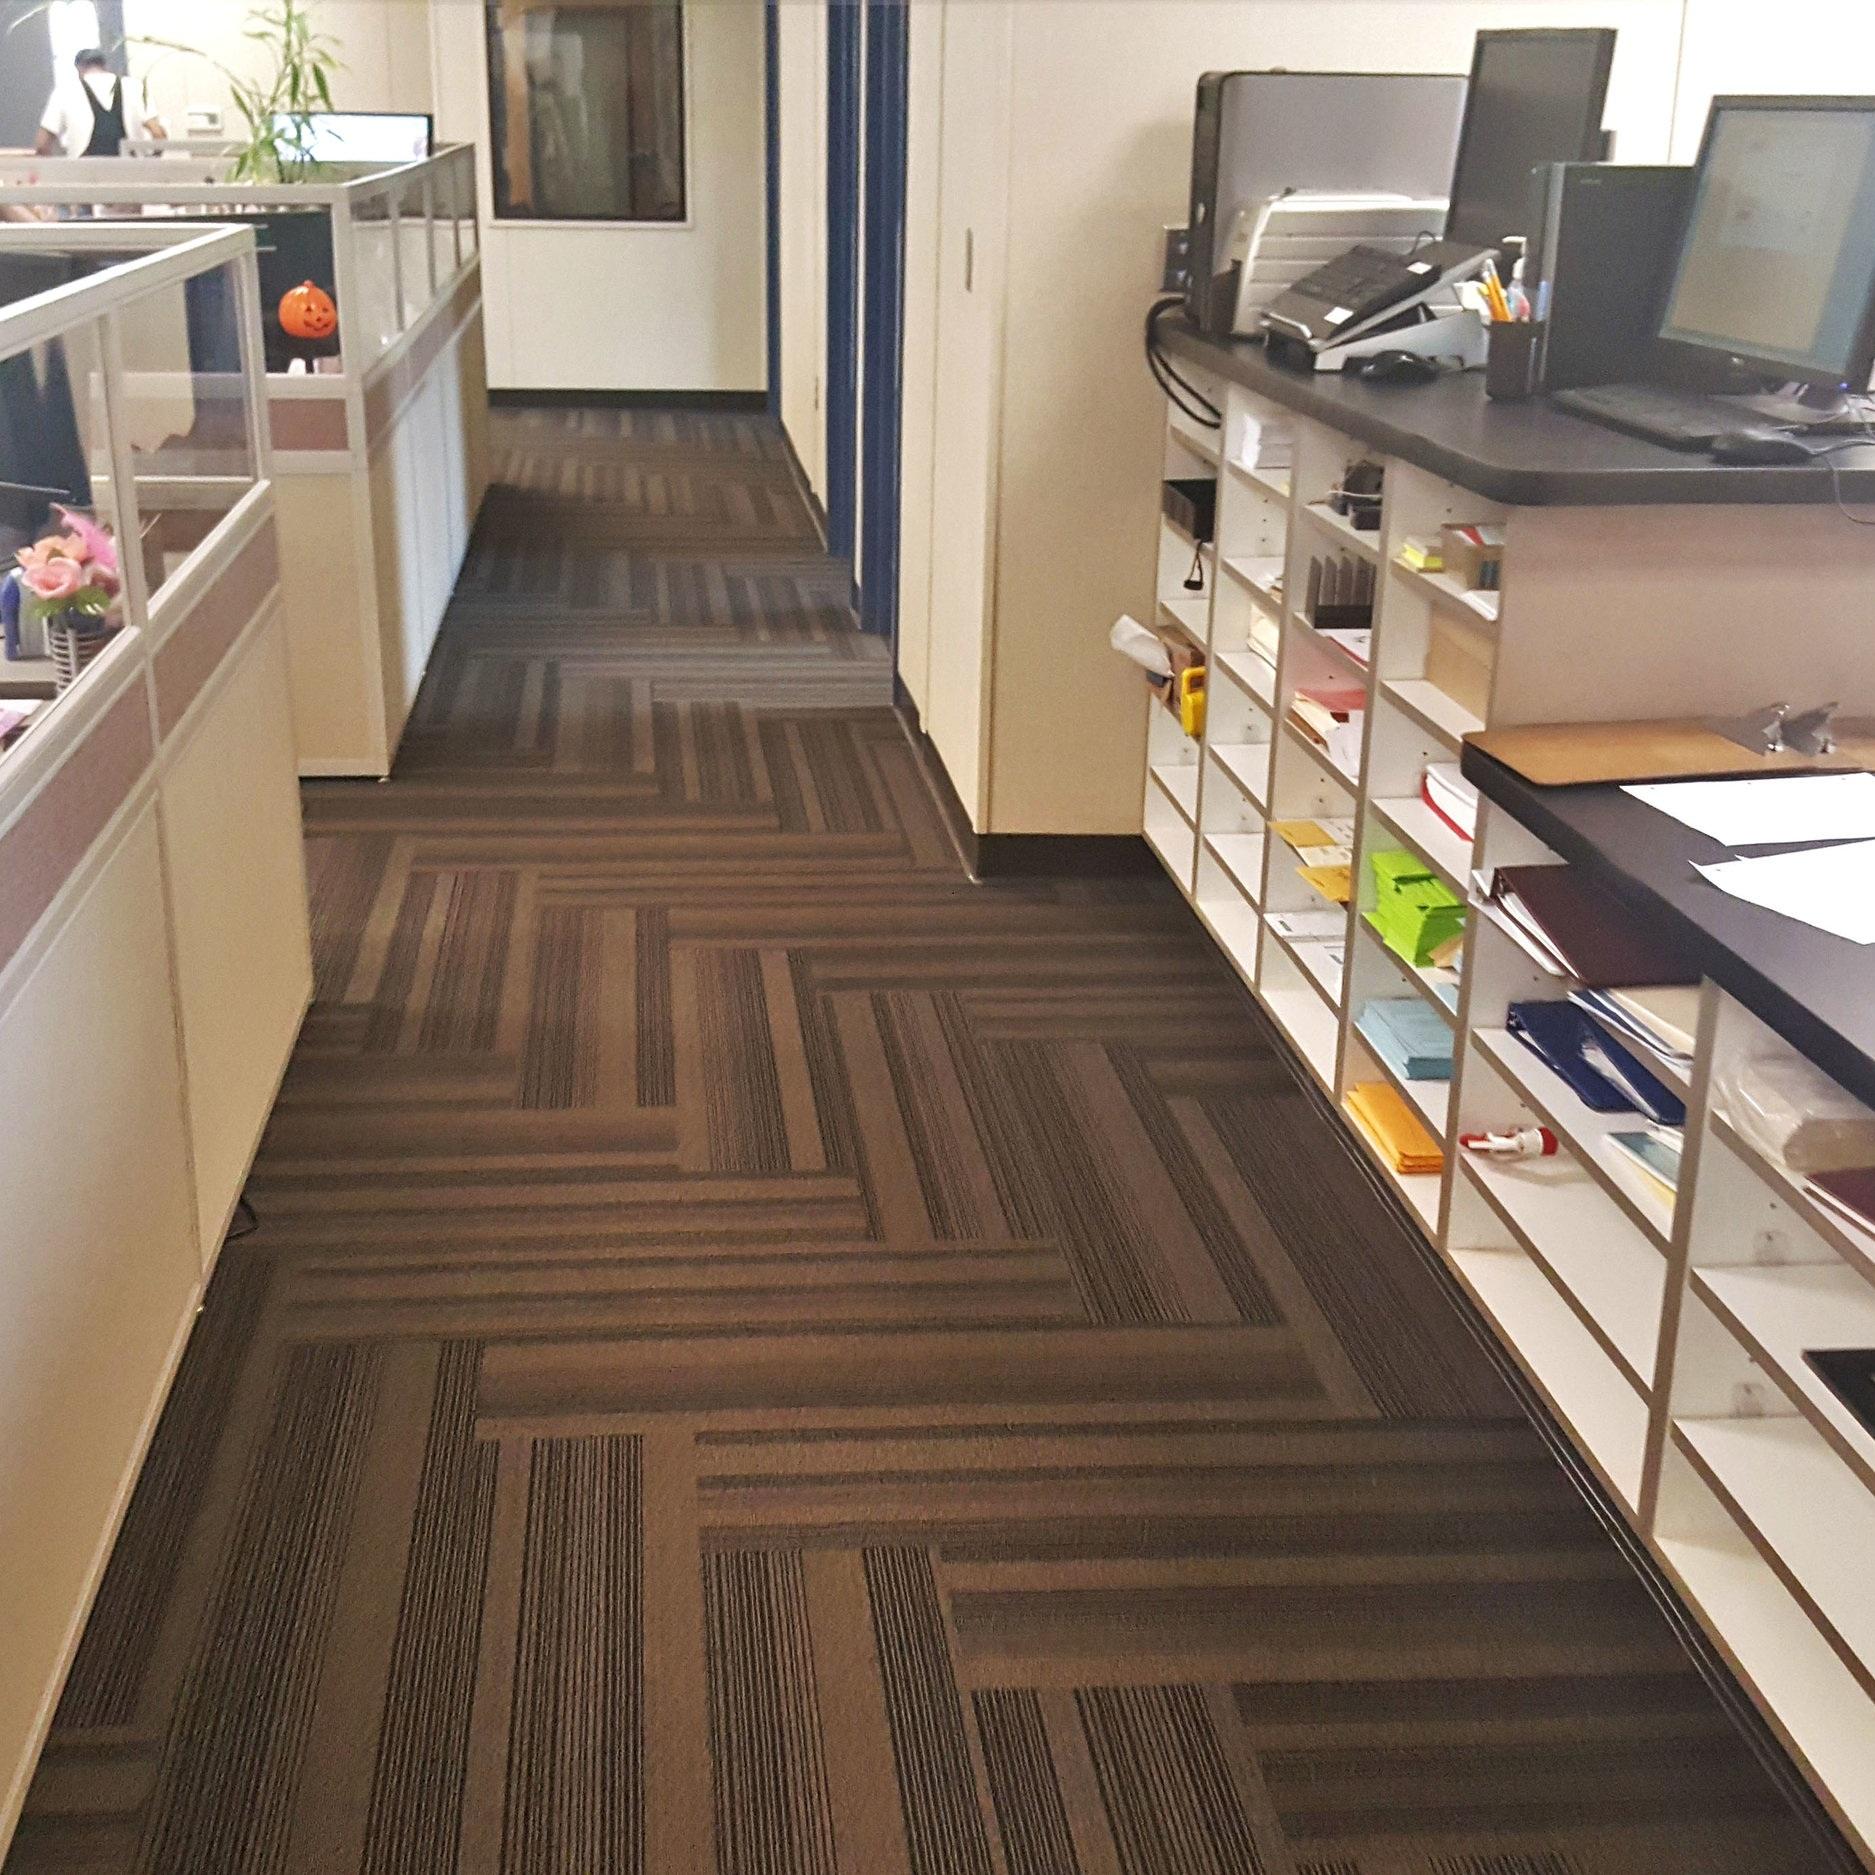 East Side UHSD - Interior Flooring